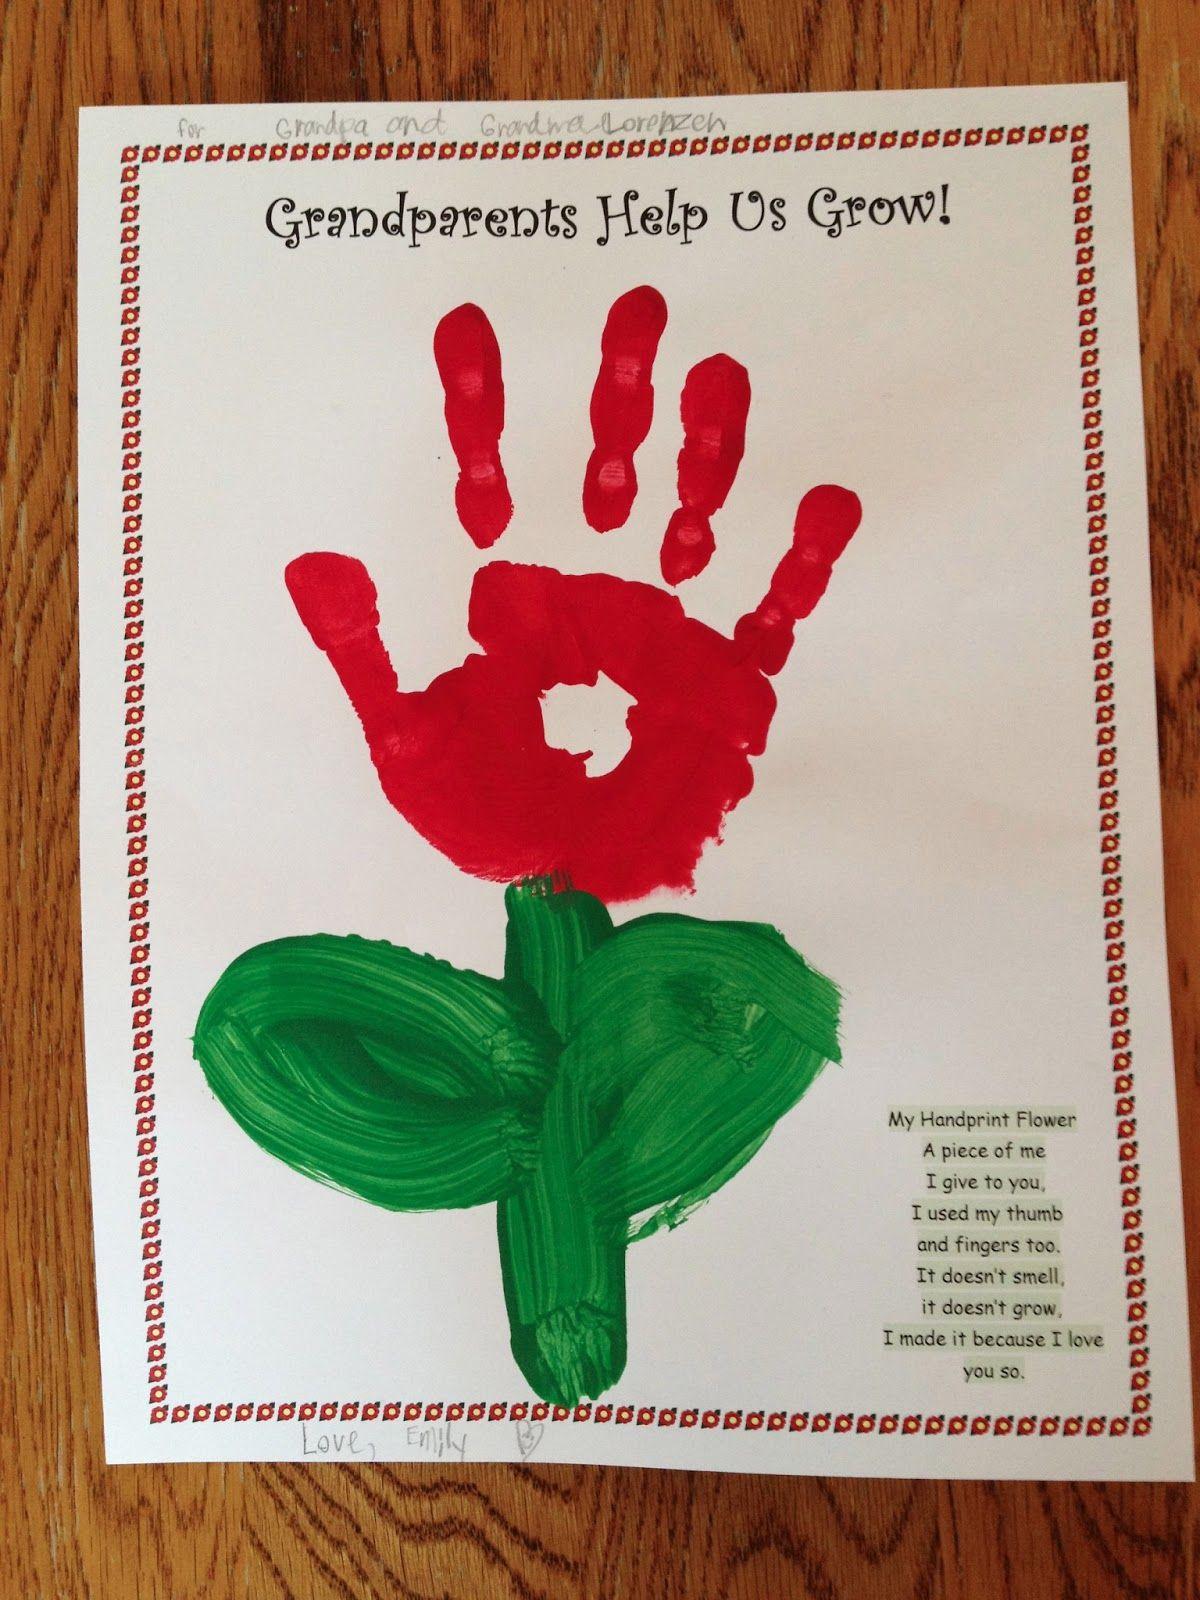 The Purpose of Grandparents Day - verywellfamily.com